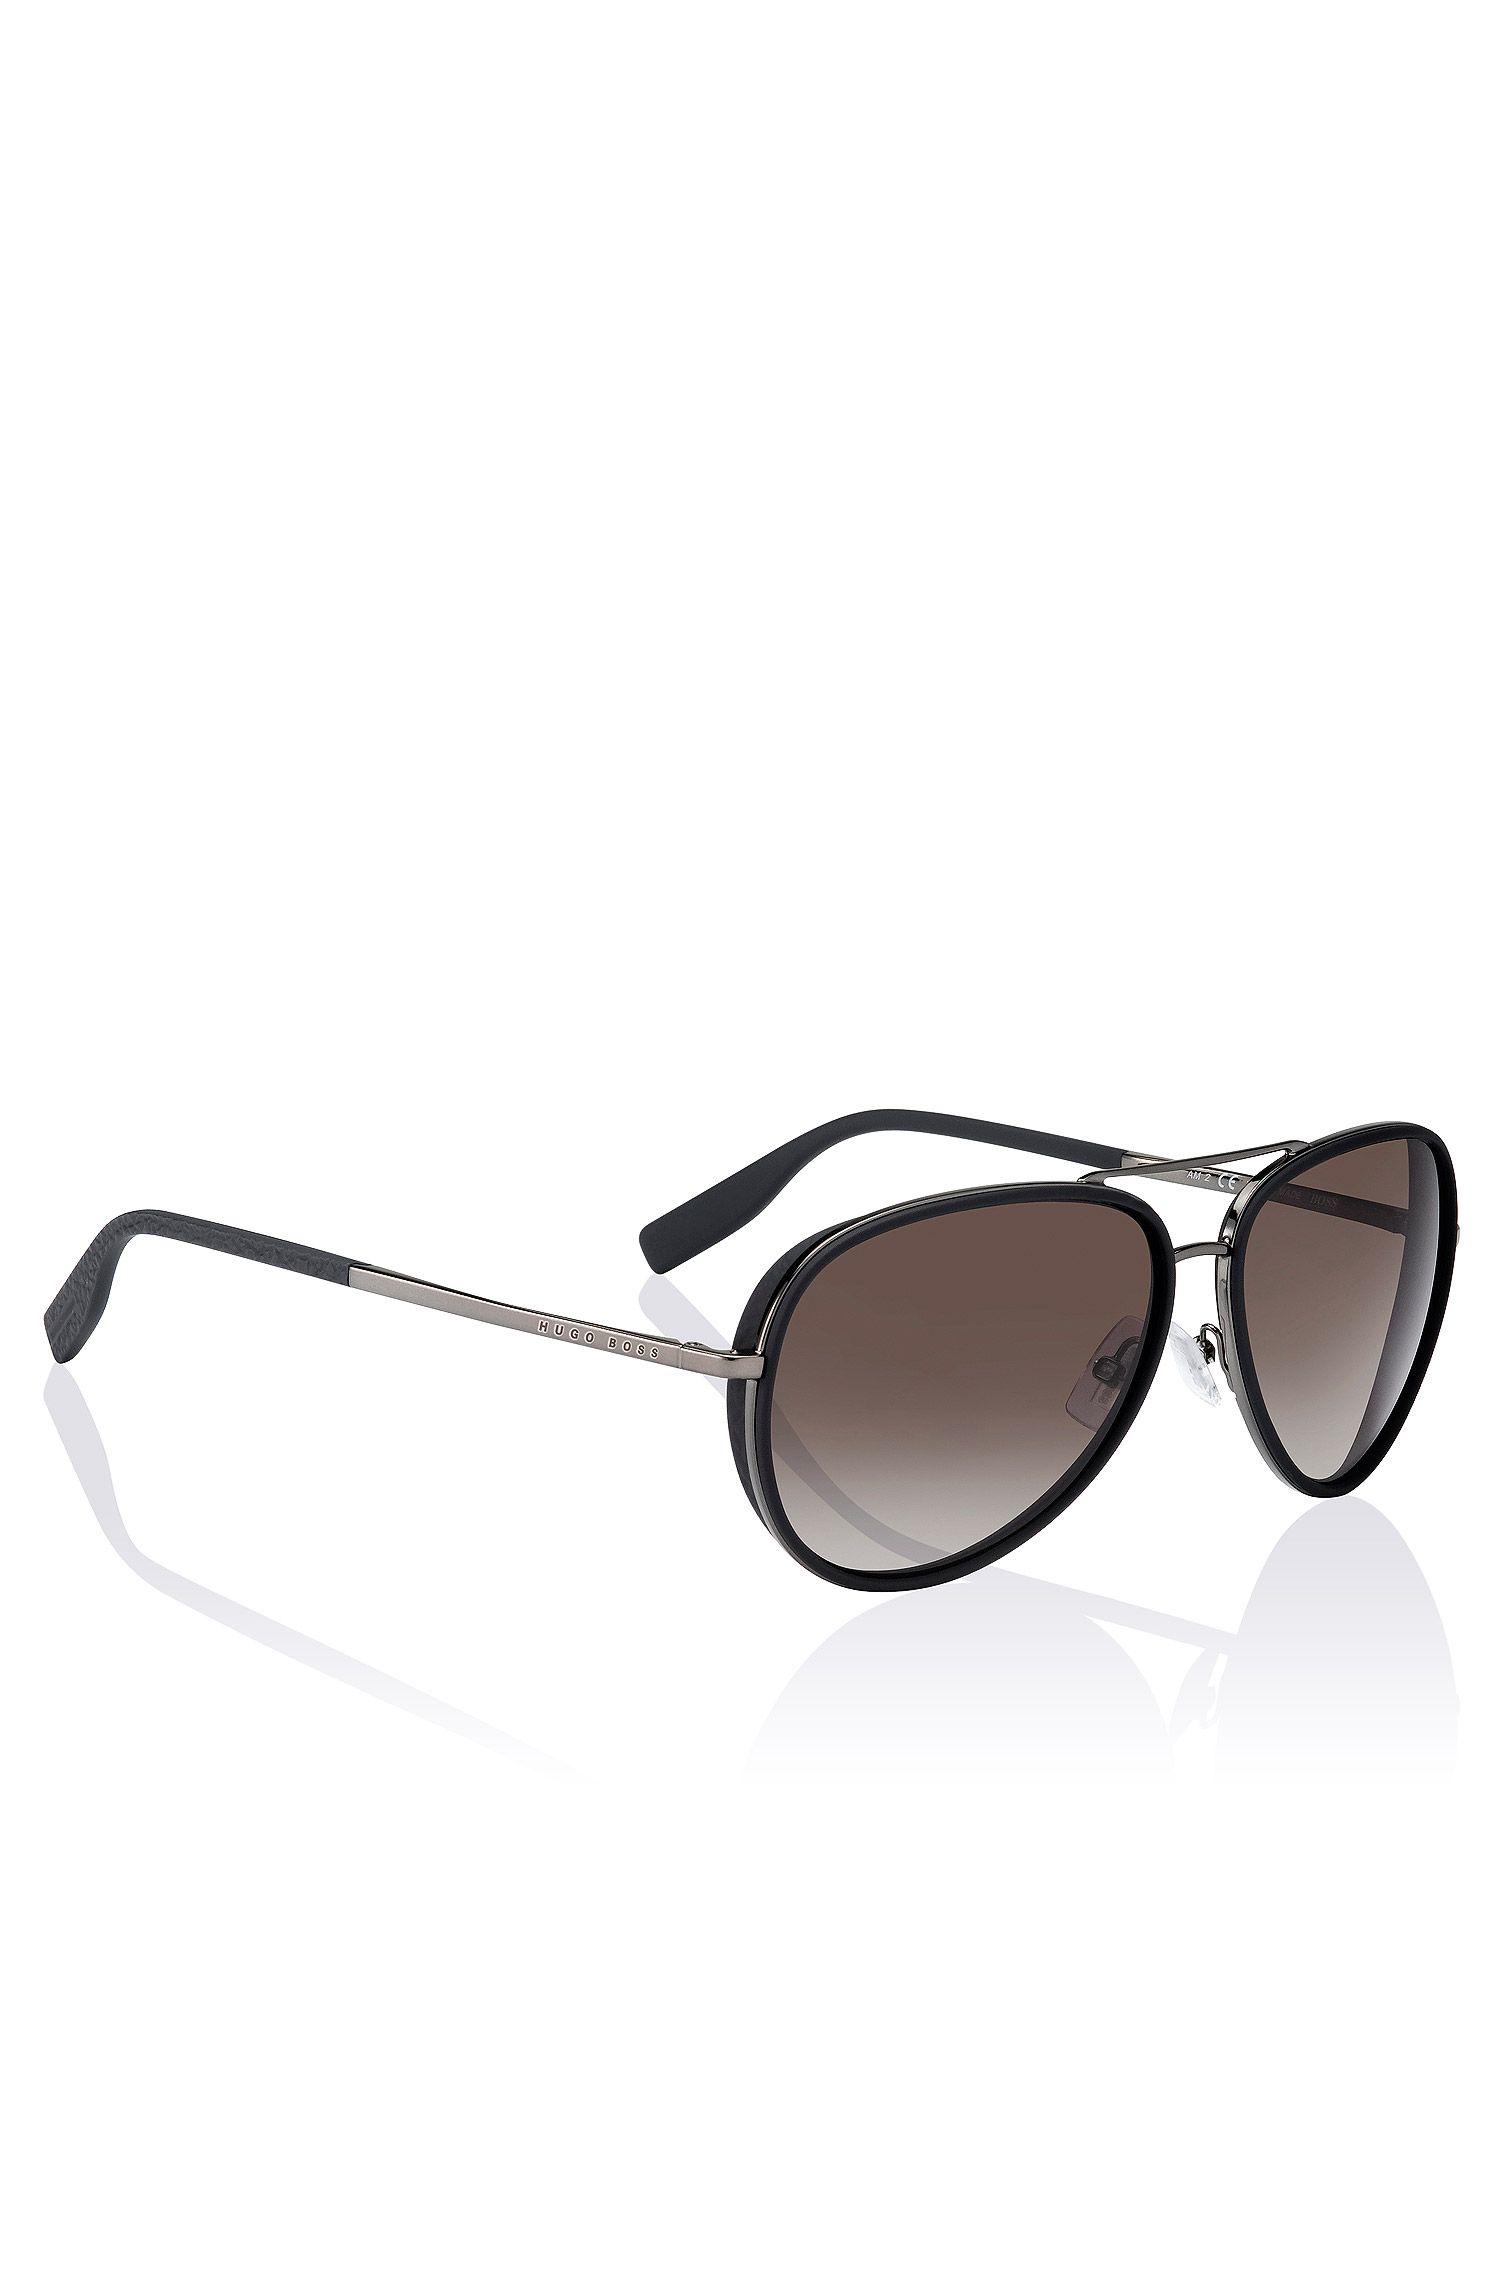 Pilotenbrille ´BOSS 0510` im Vintage-Stil